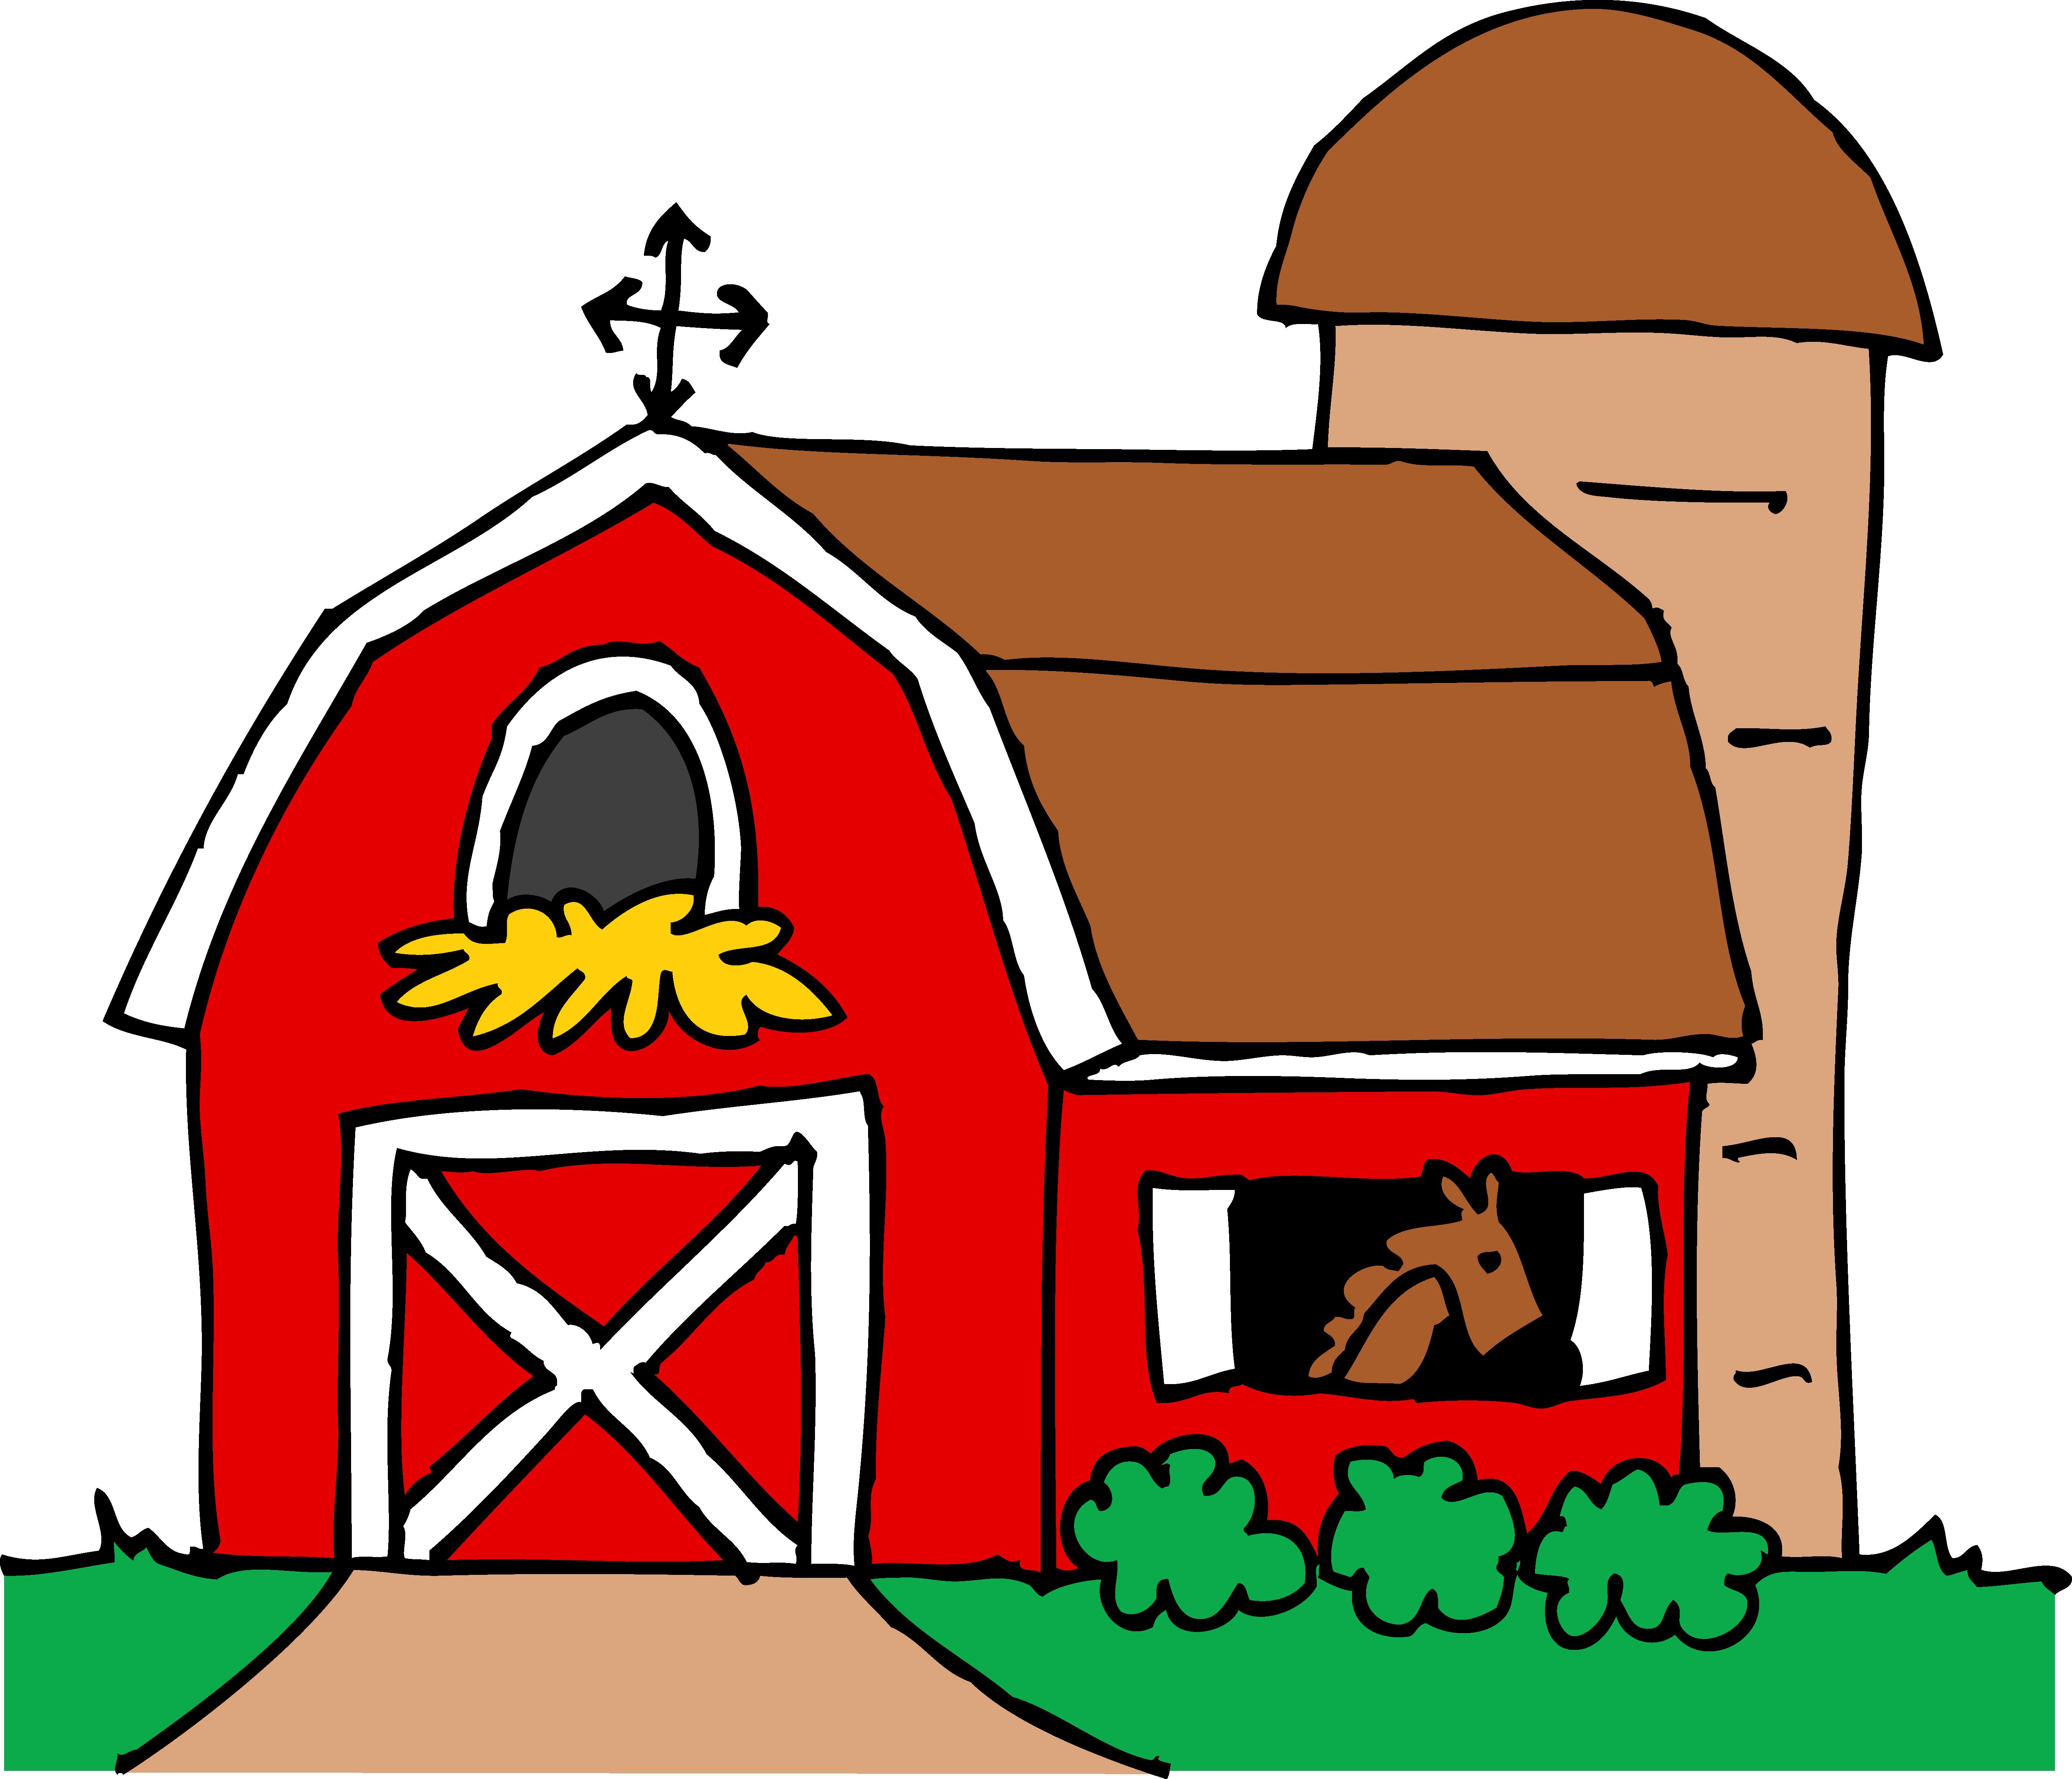 Farm cartoon clipart png freeuse stock Barn Clipart | Free download best Barn Clipart on ClipArtMag.com png freeuse stock